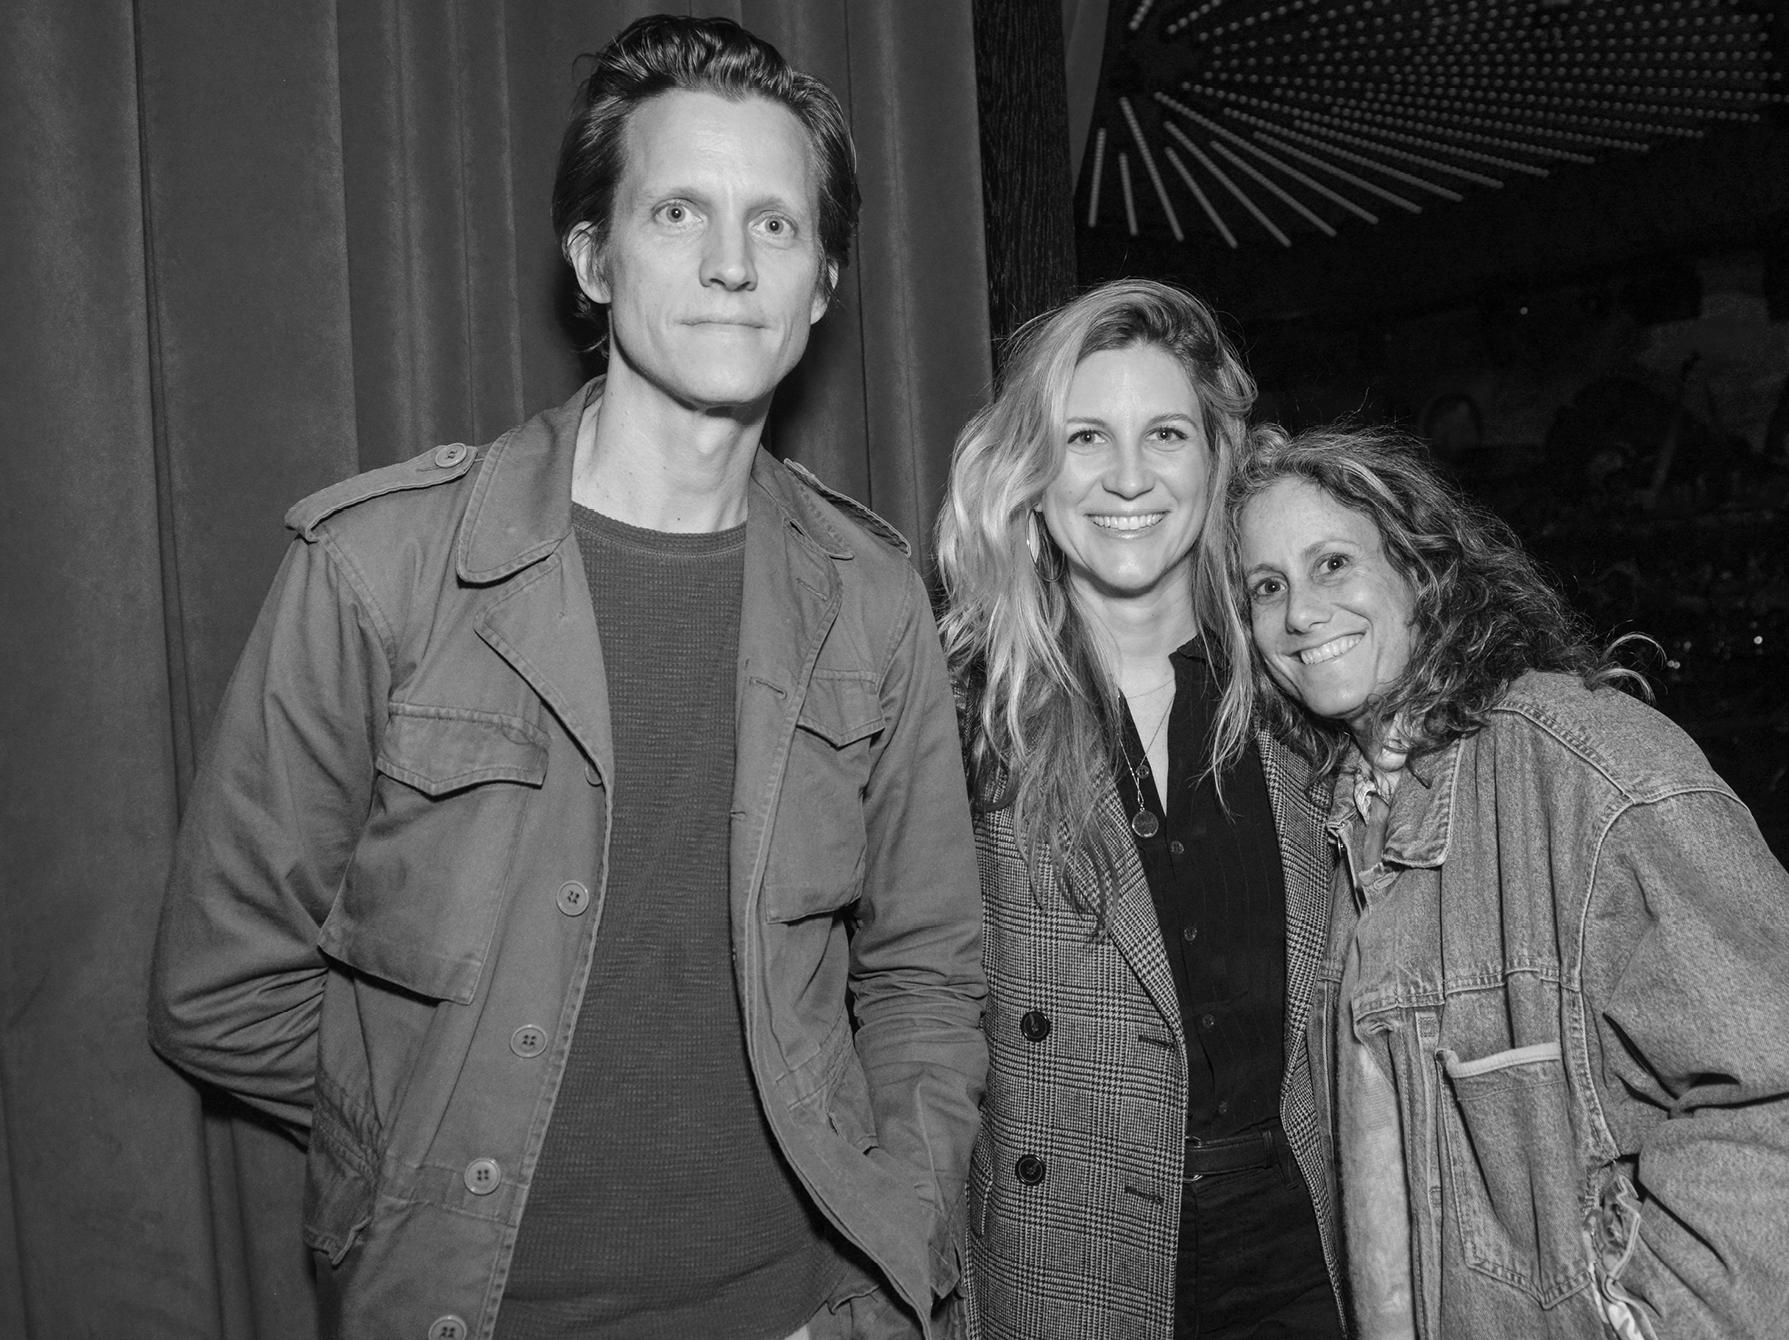 Magnus Berger, Kristina O'Neill, and Cass Bird